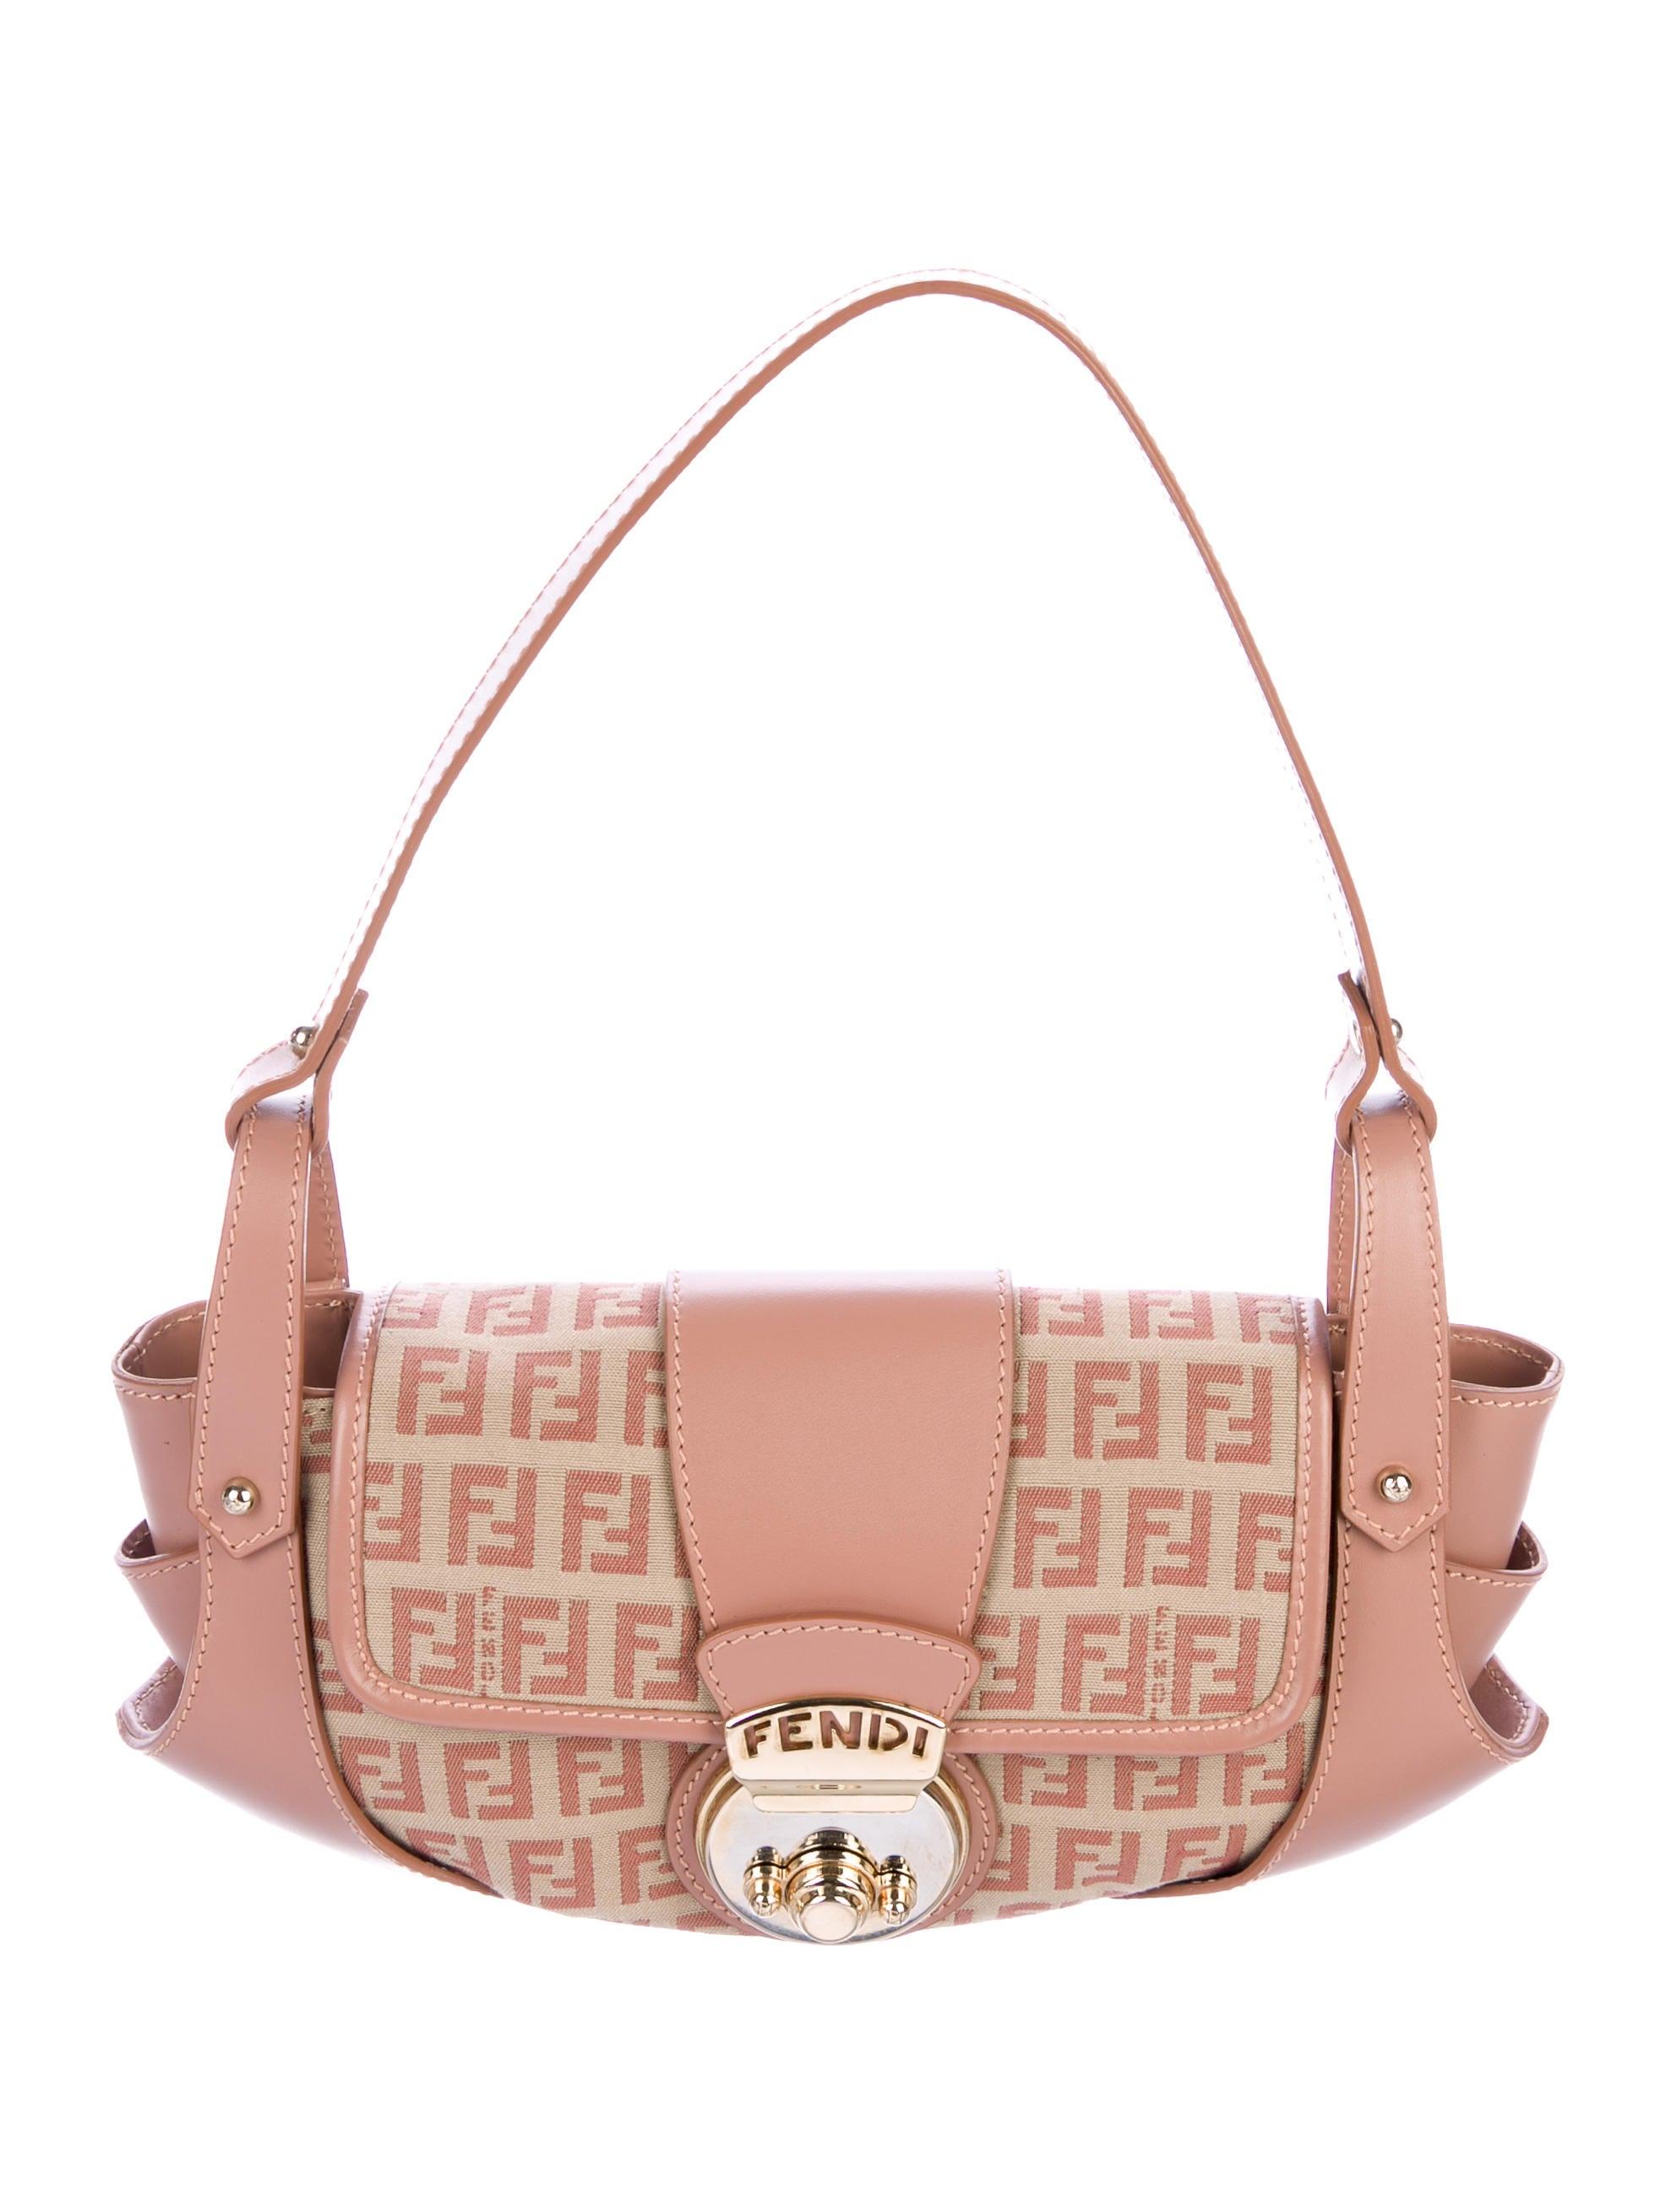 9dc7e1269393 Fendi Zucchino Compilation Bag - Handbags - FEN88964